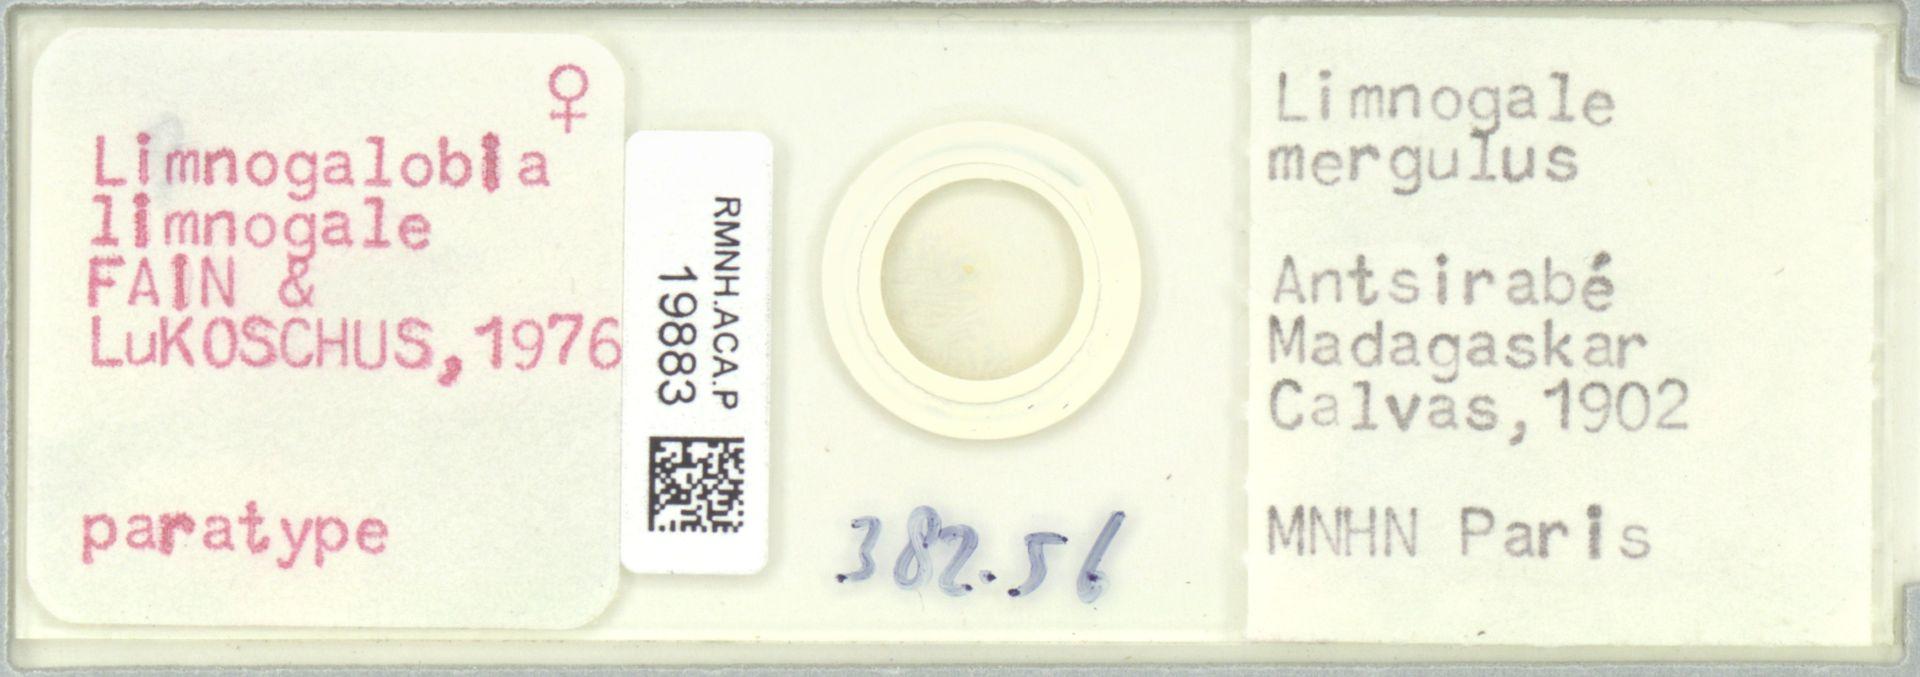 RMNH.ACA.P.19883 | Limnogalobia limnogale Fain & Lukoschus, 1976